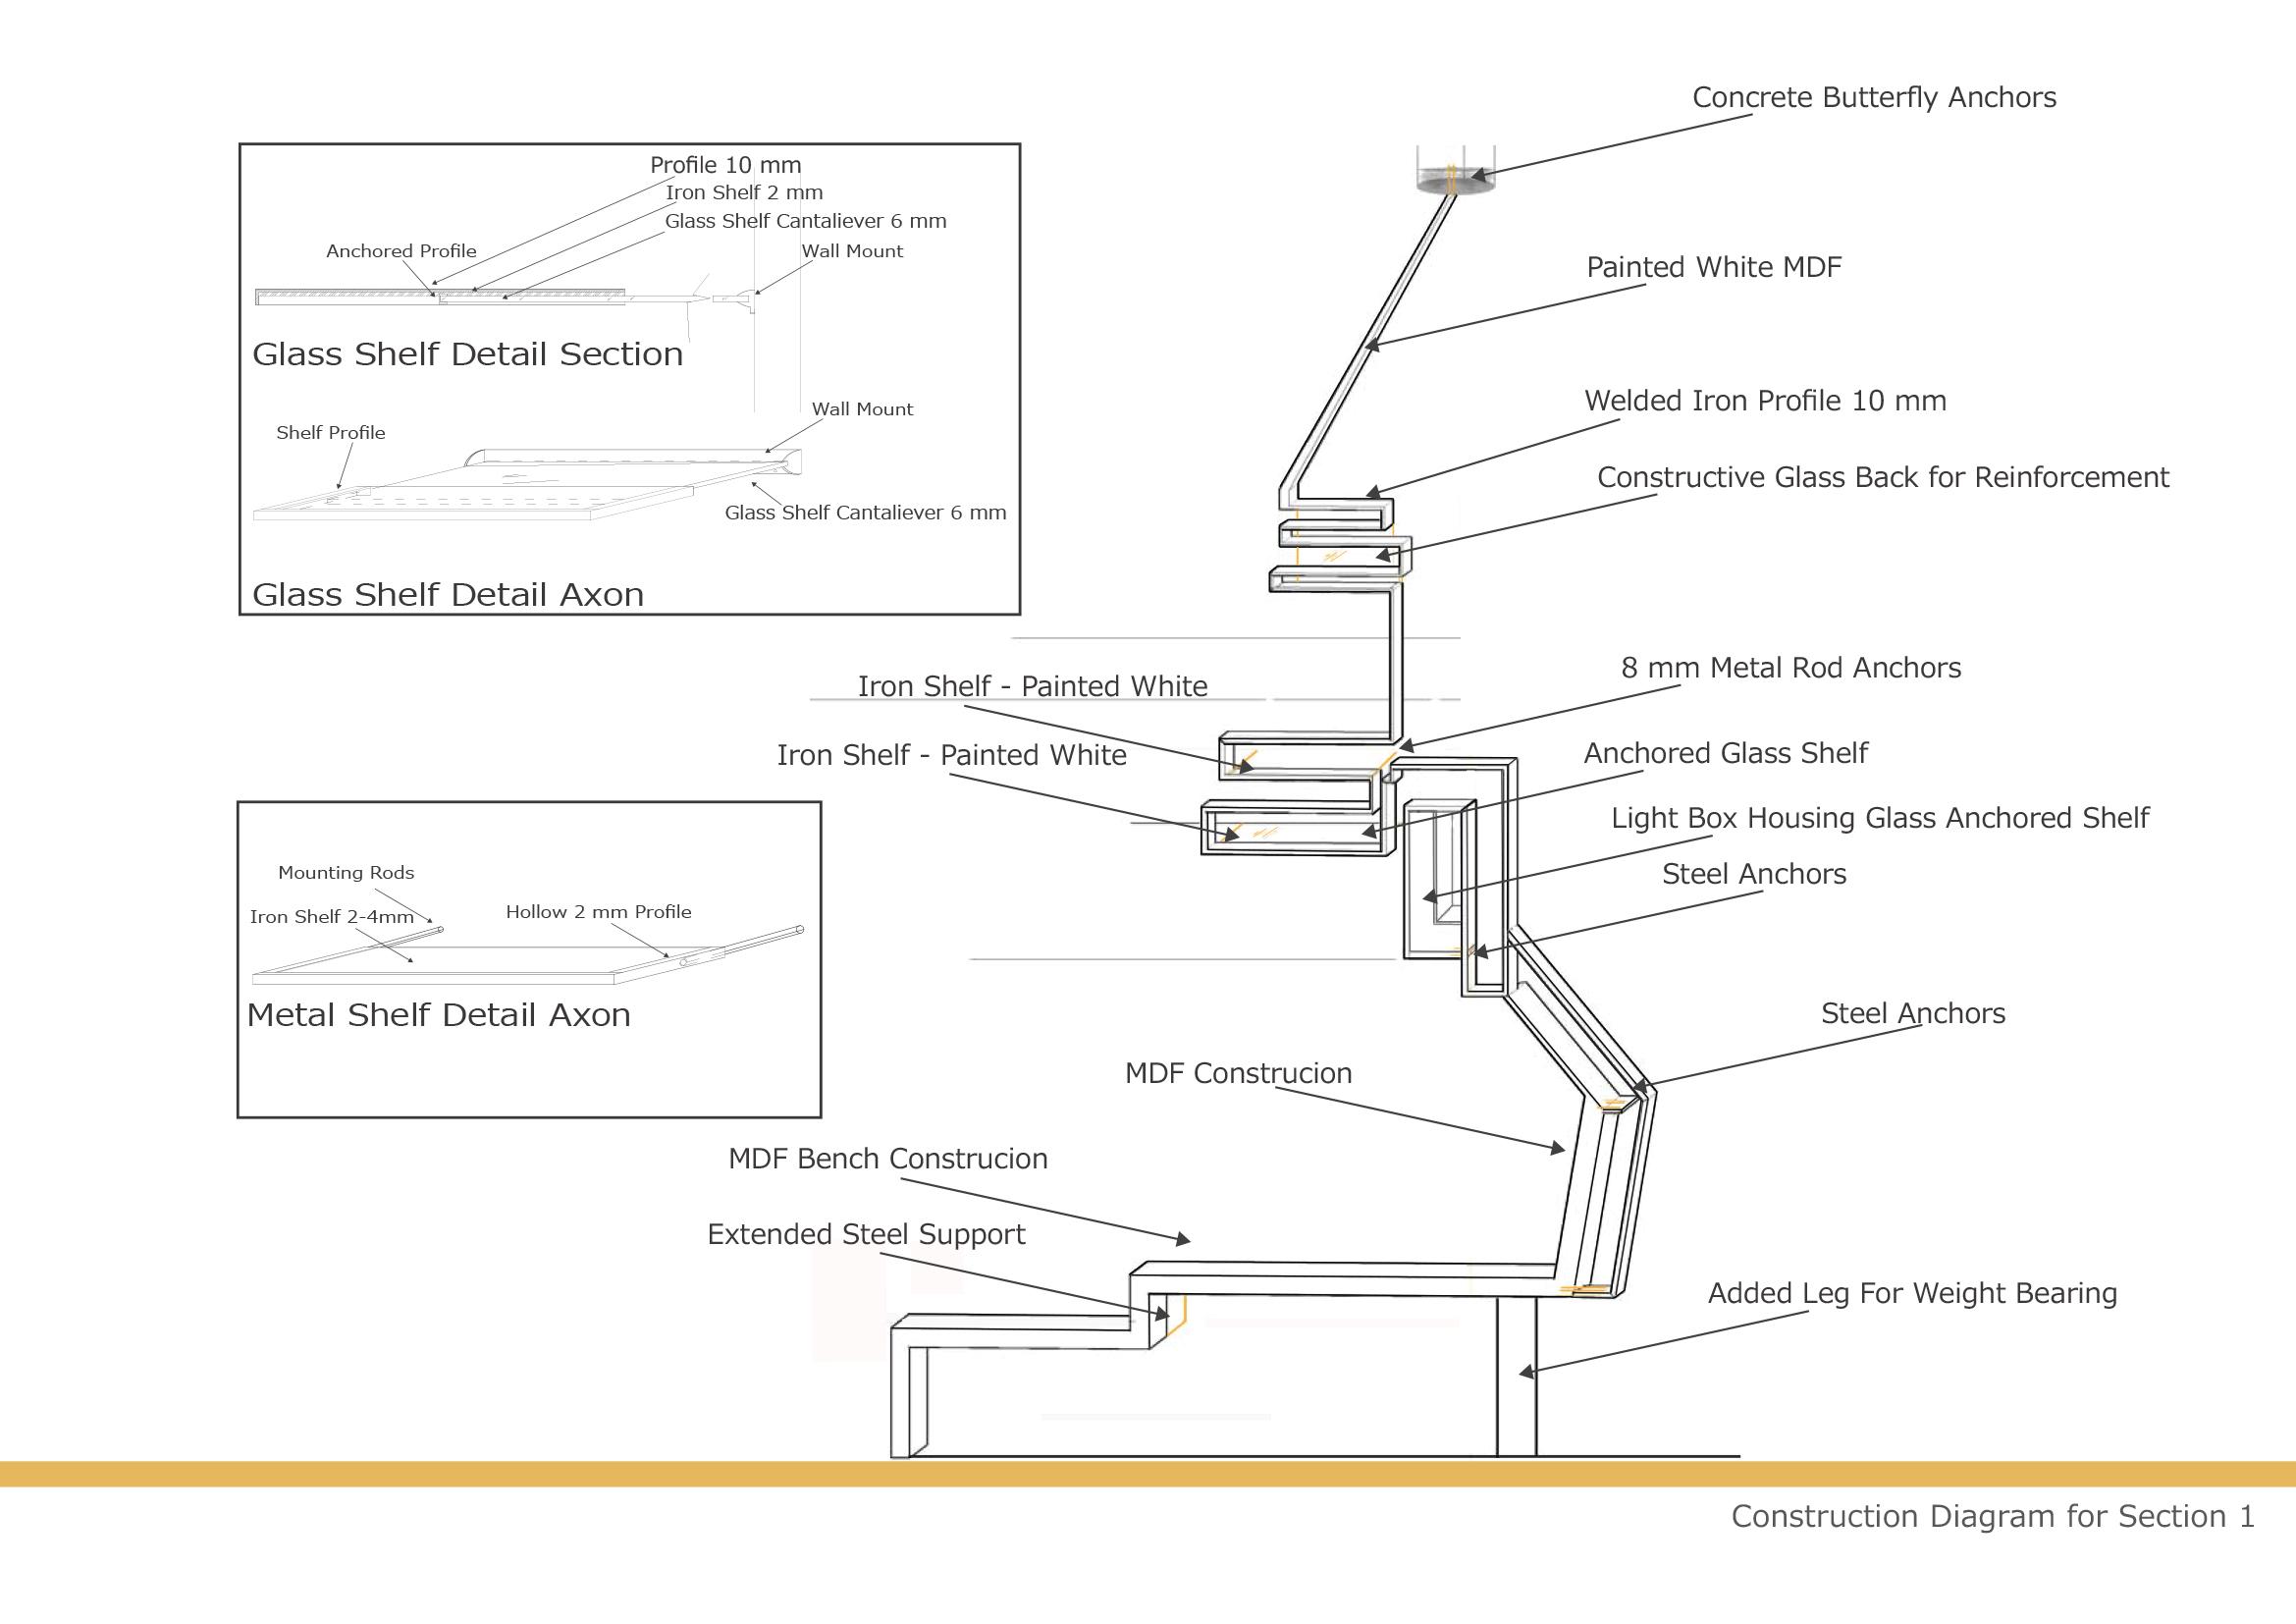 Construction Diagram 02